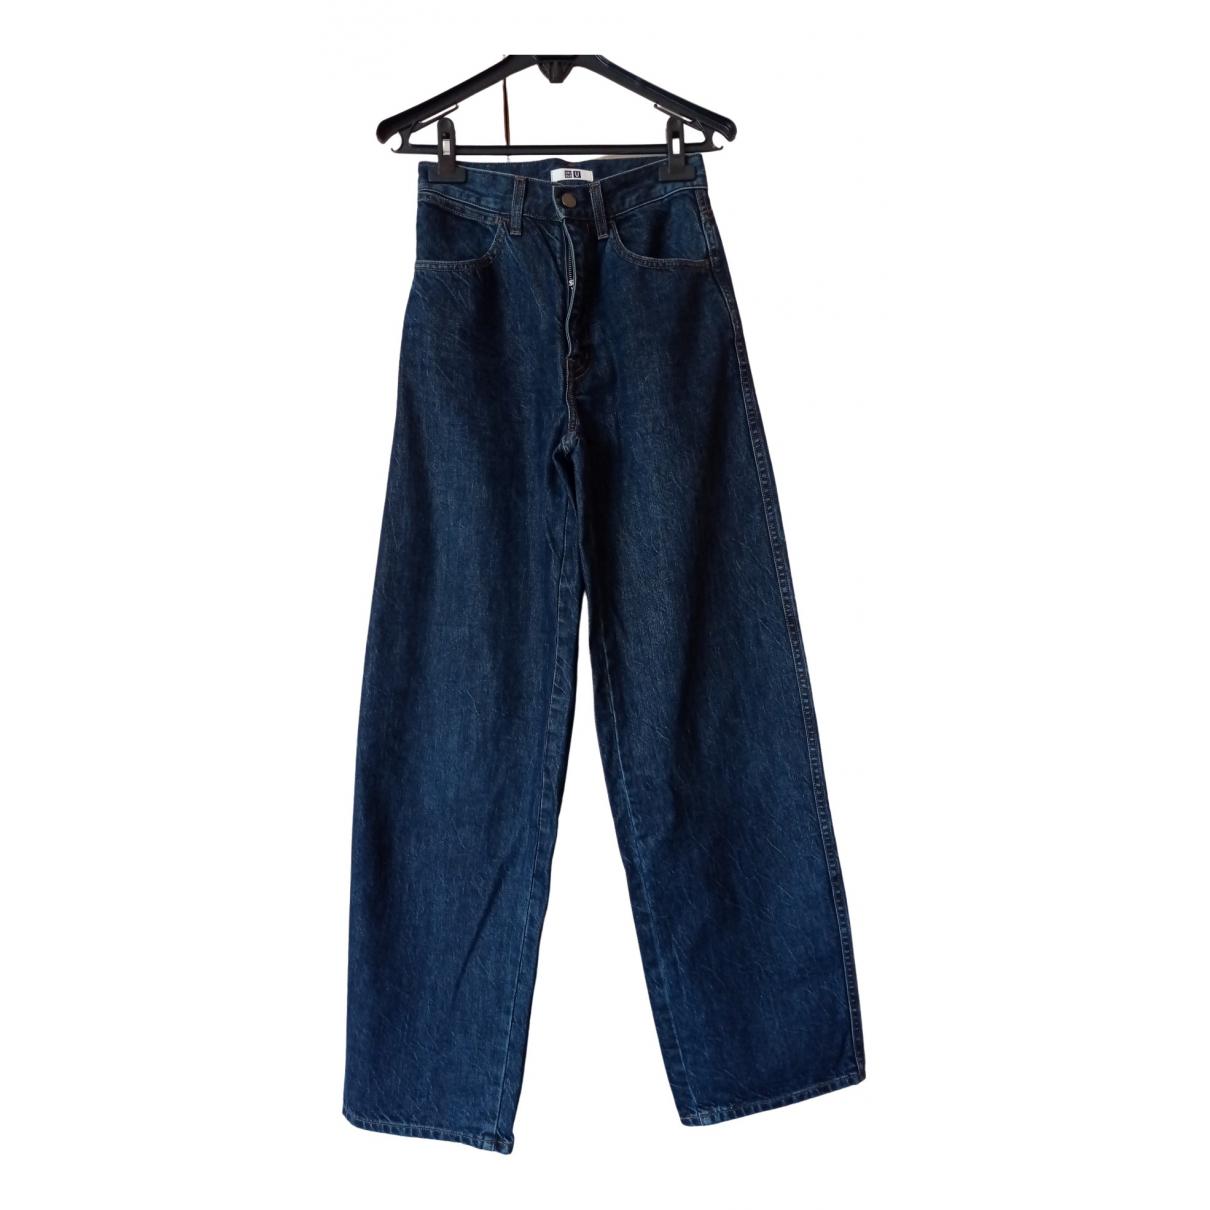 Uniqlo N Denim - Jeans Jeans for Women 24 US